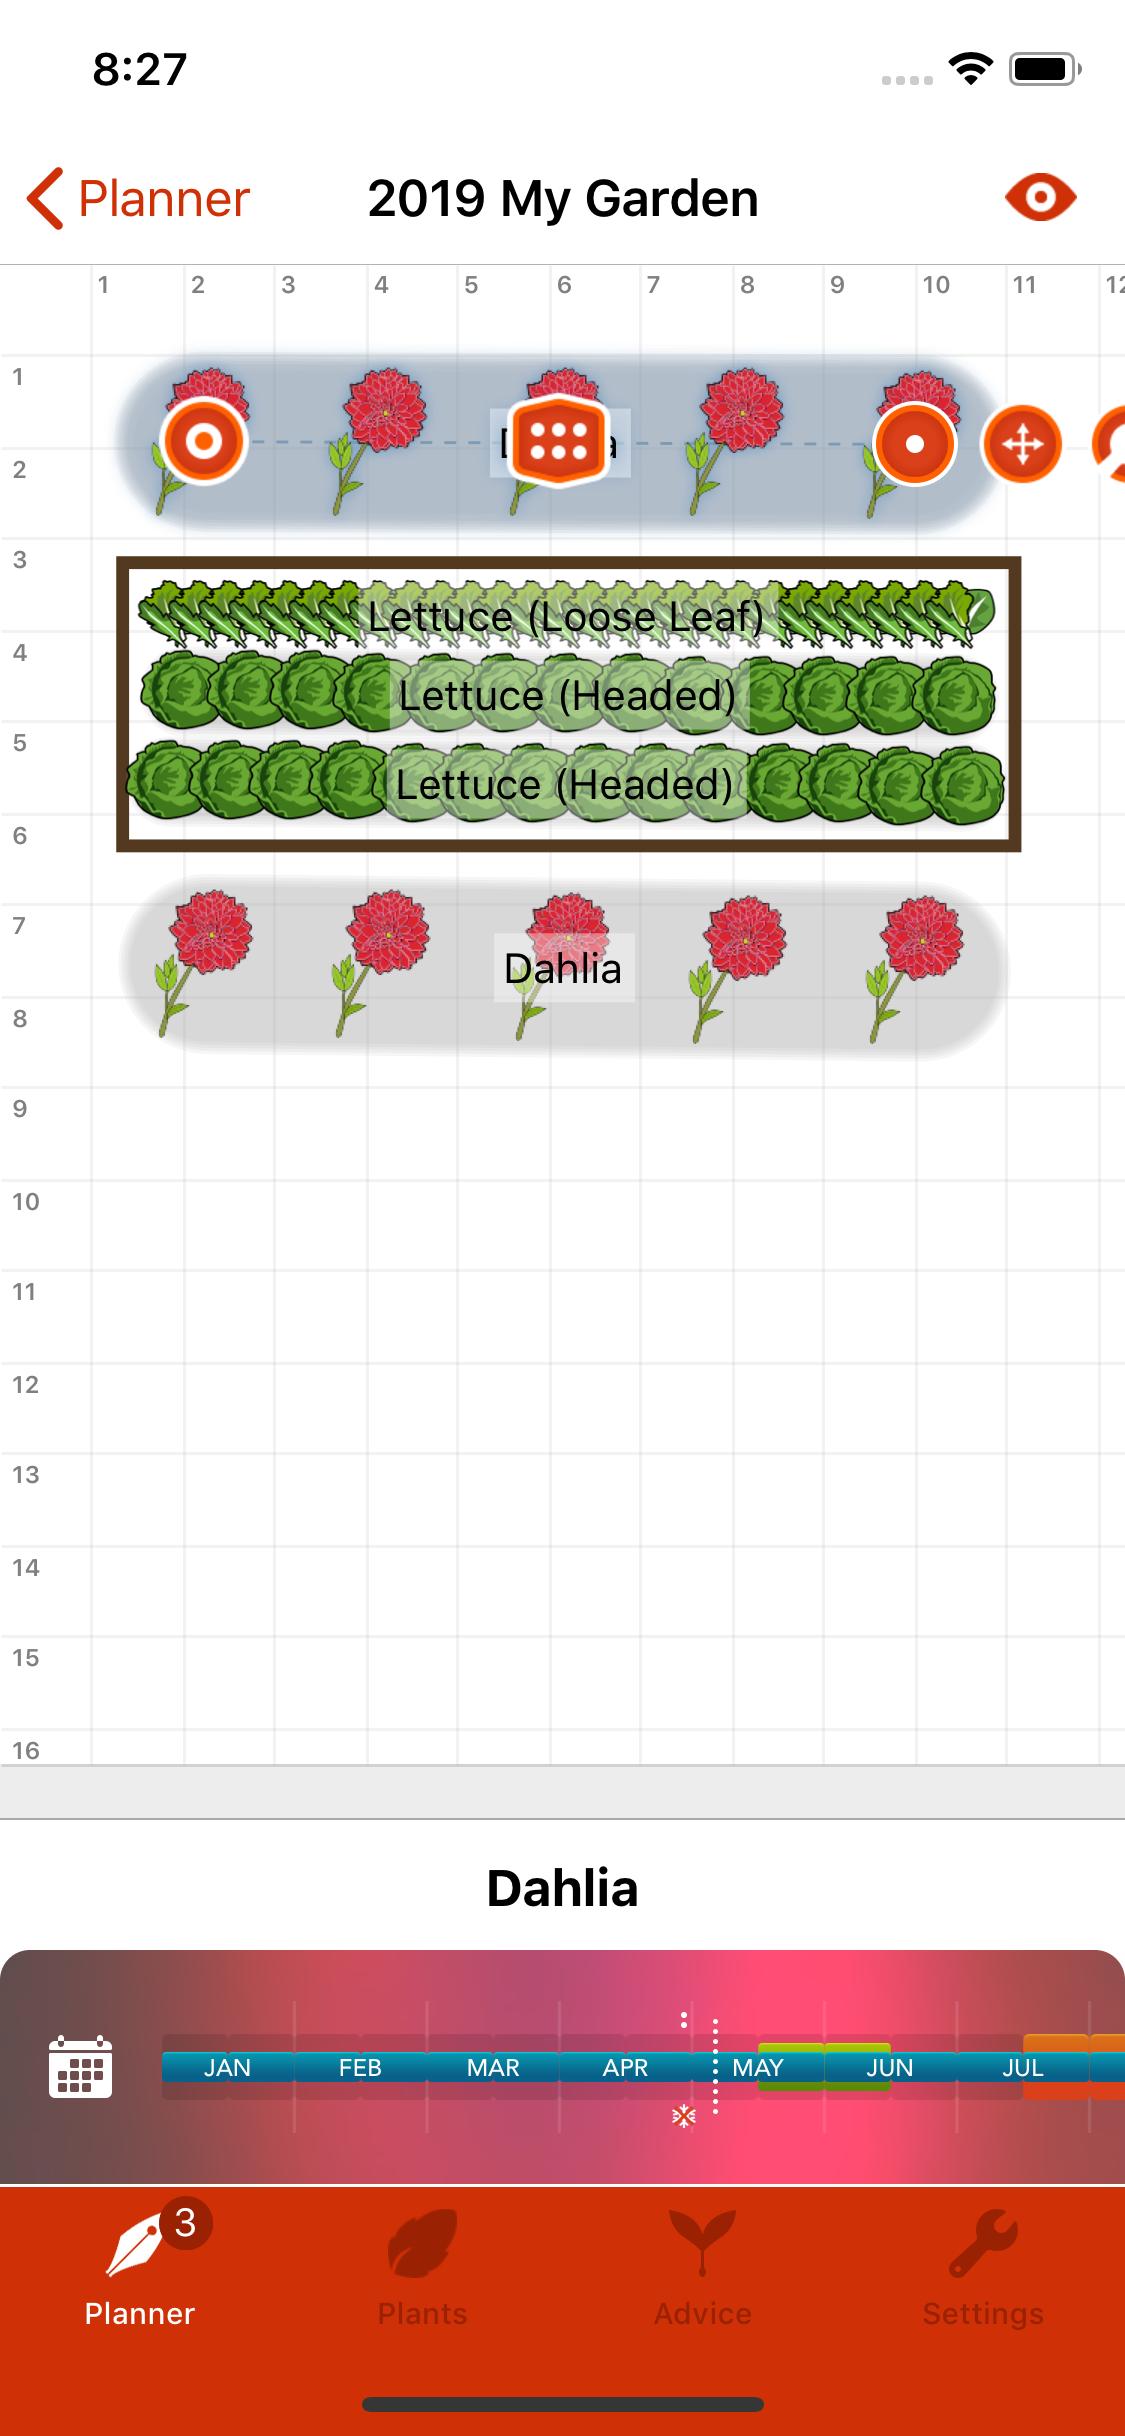 Garden Plan Pro - A Garden Planner App for iPhone - Design